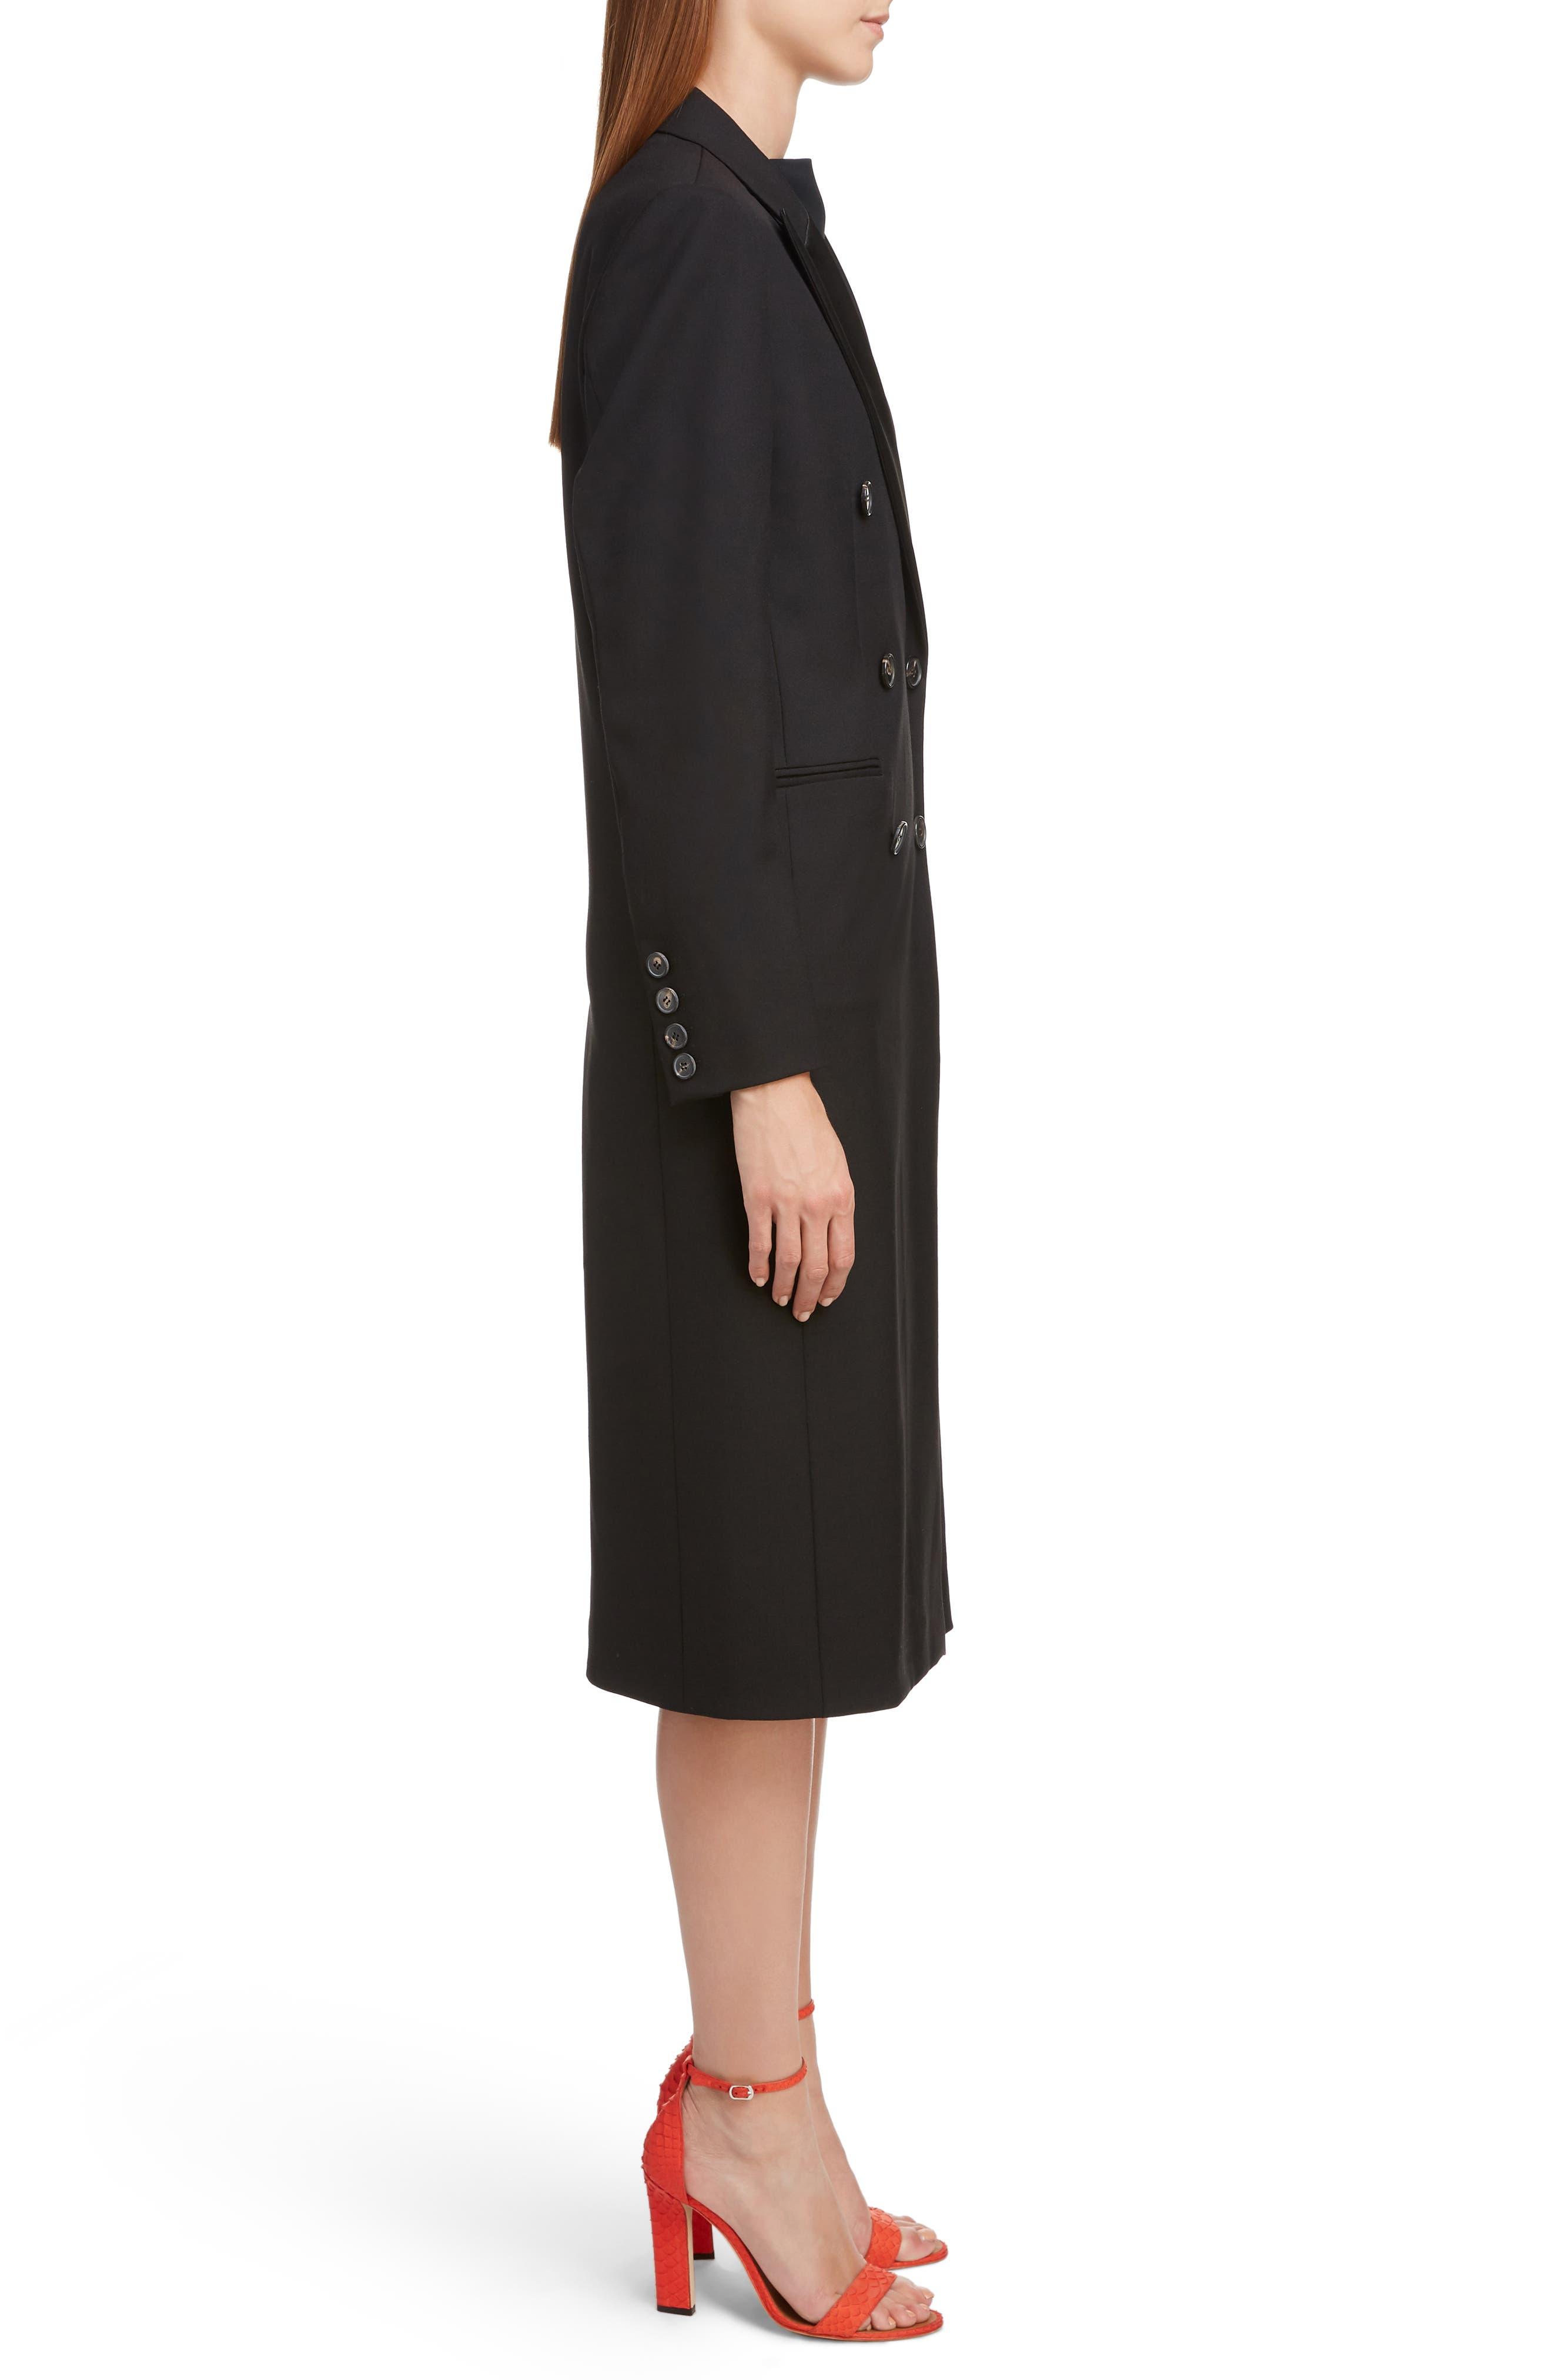 VICTORIA BECKHAM, Wool & Mohair Tuxedo Coat, Alternate thumbnail 3, color, BLACK